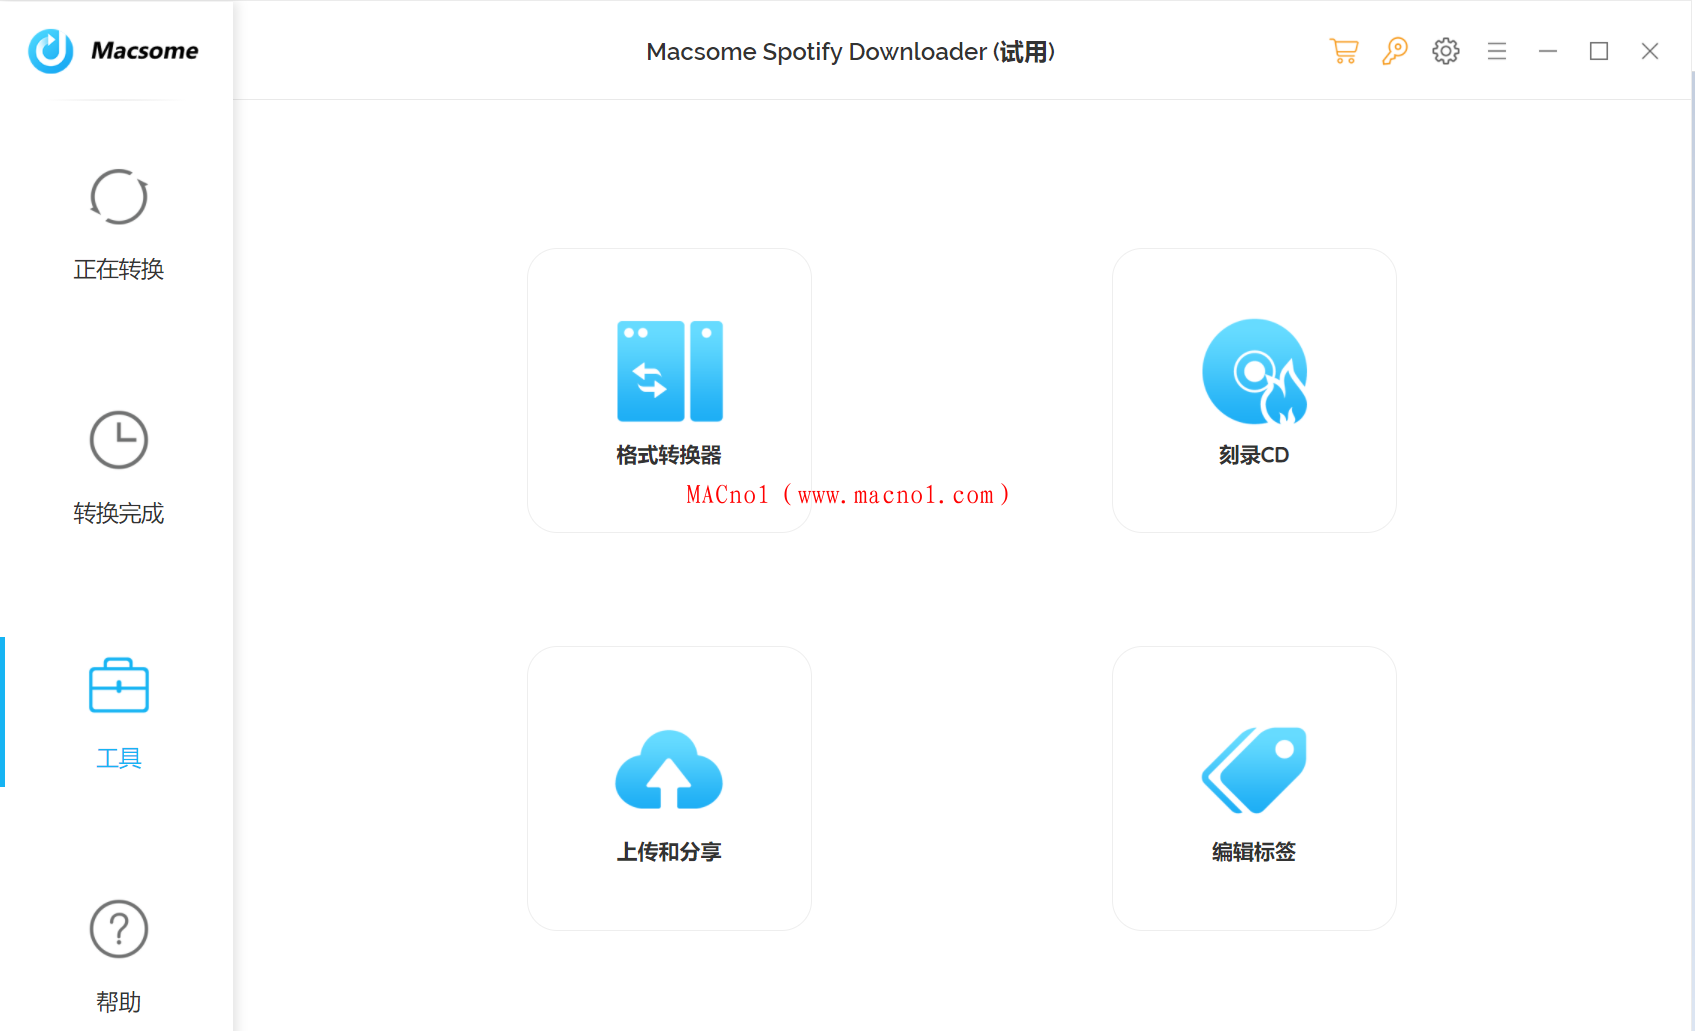 Macsome Spotify Downloader 注册机.png